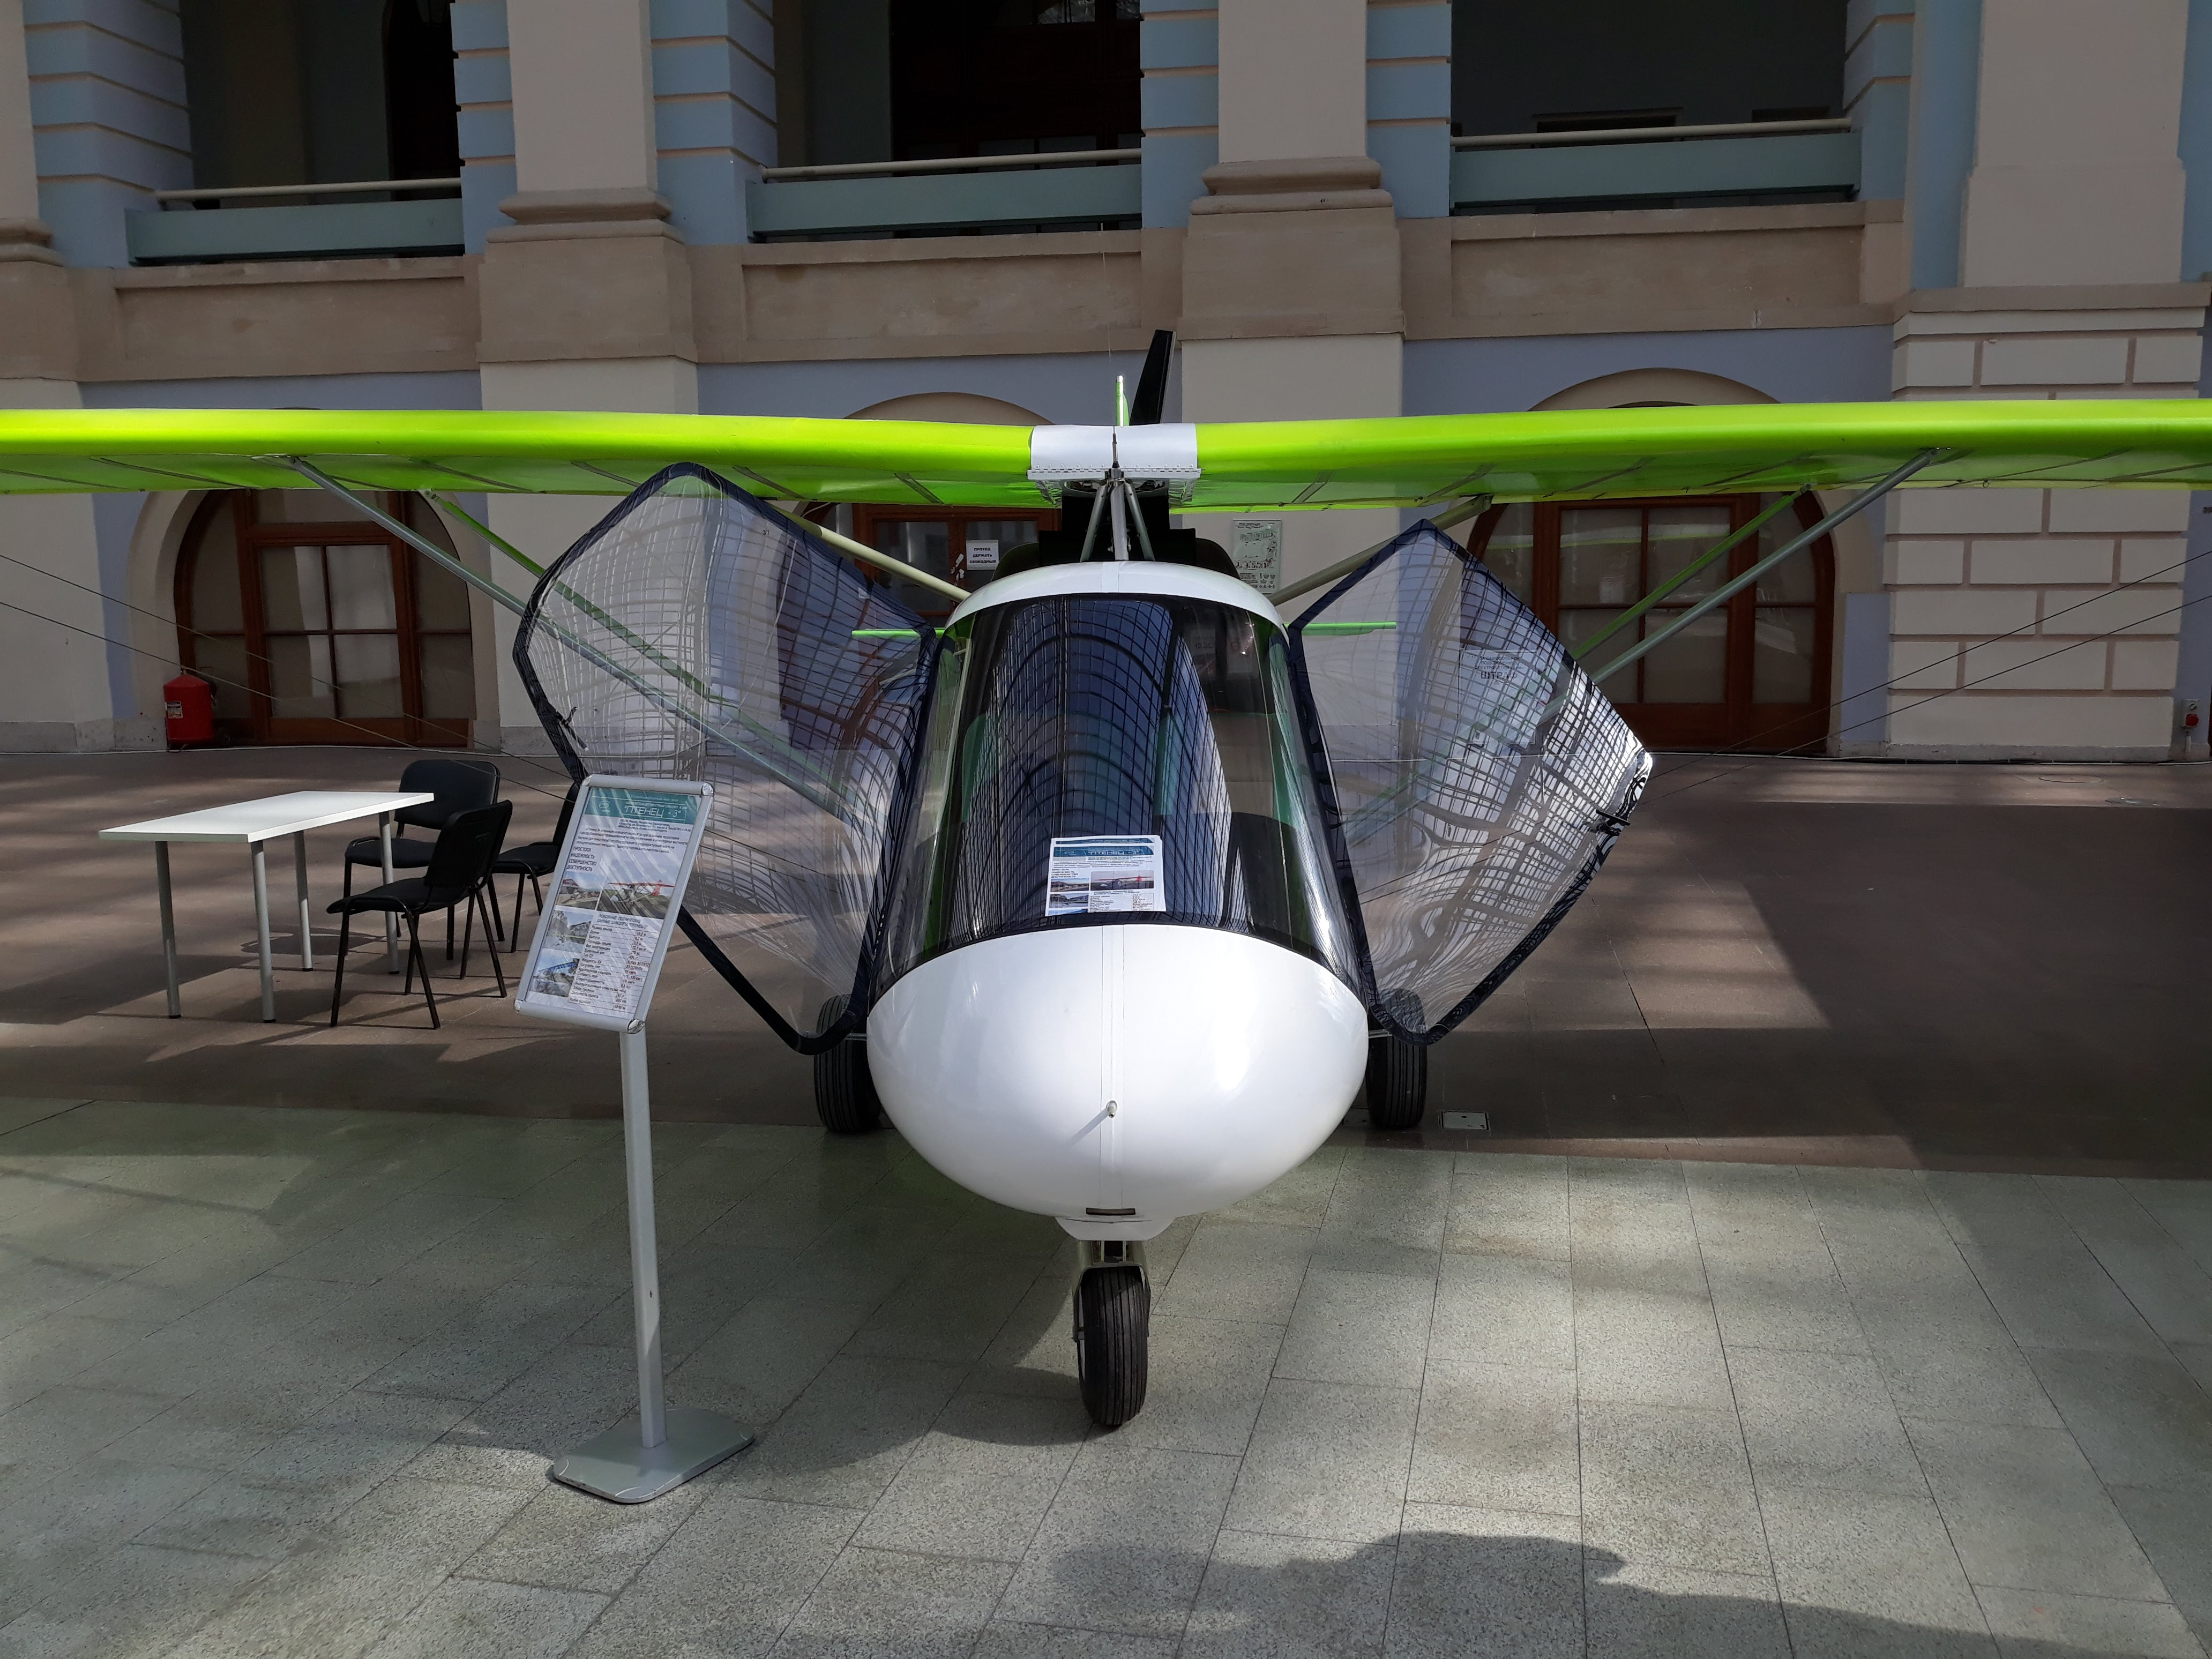 Ультралёгкий самолёт Птенец-3